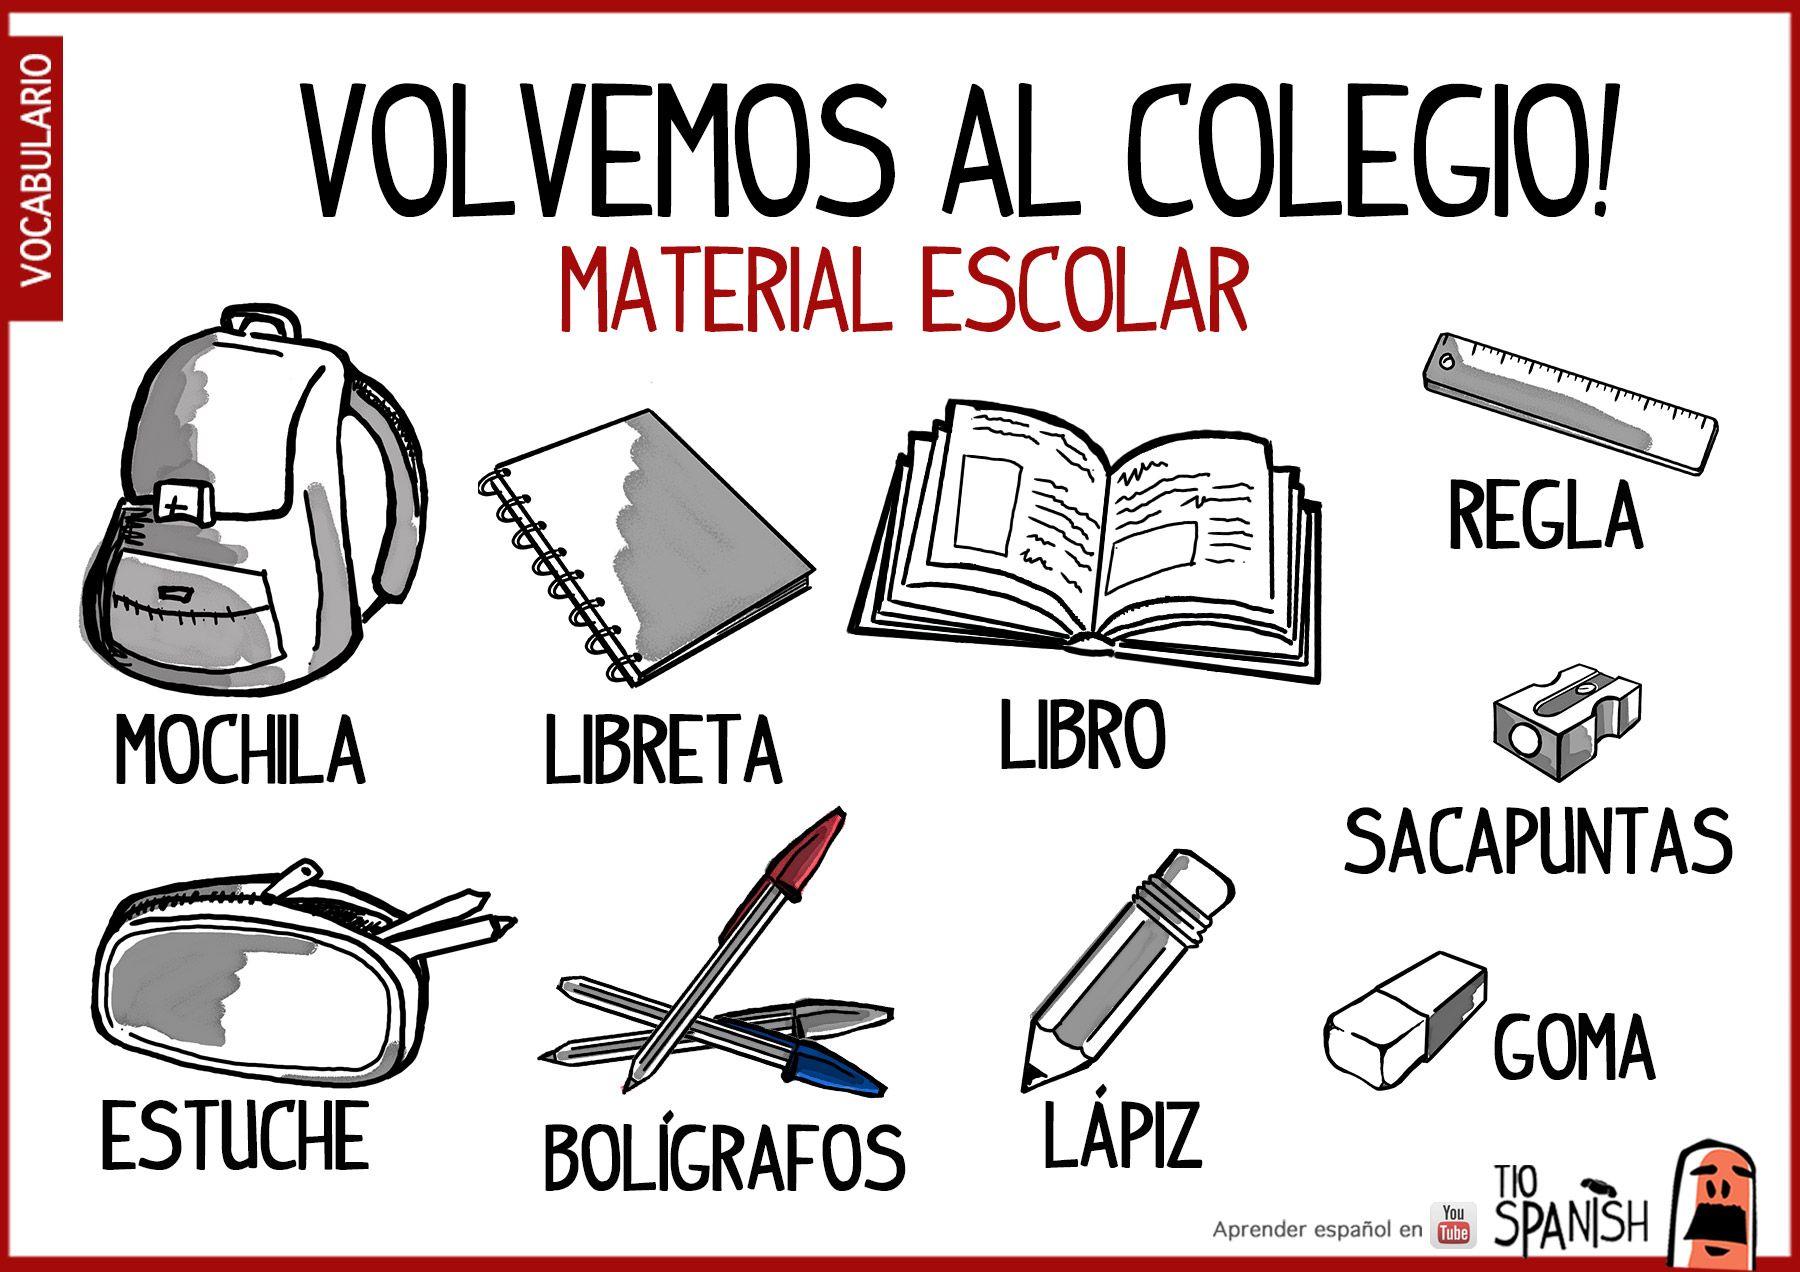 Vocabulario Espanol Material Escolar